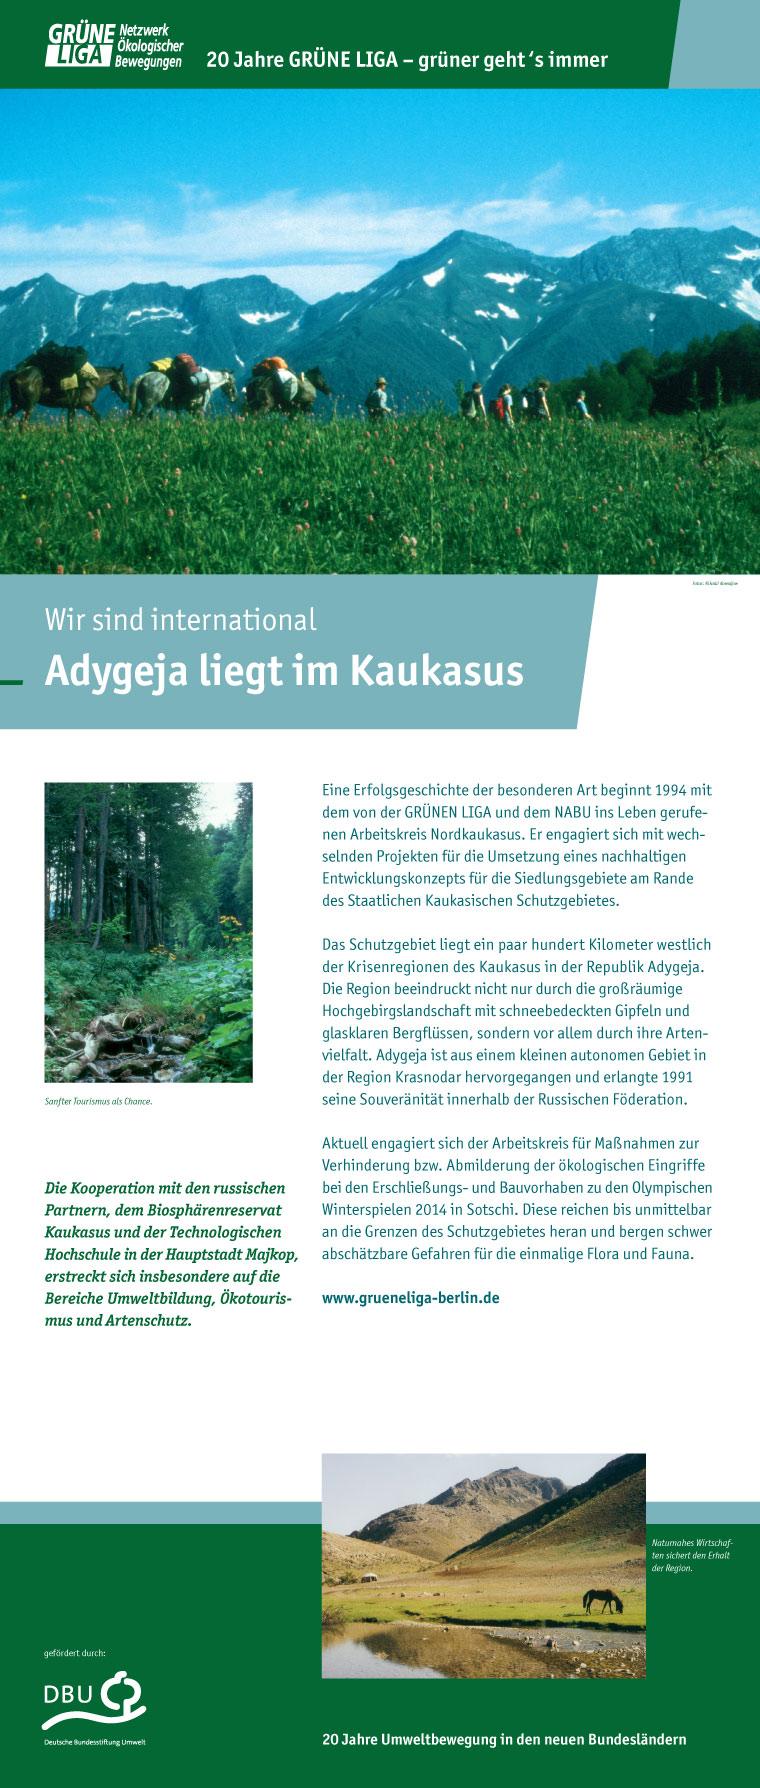 Wir sind international - Adygeja liegt im Kaukasus